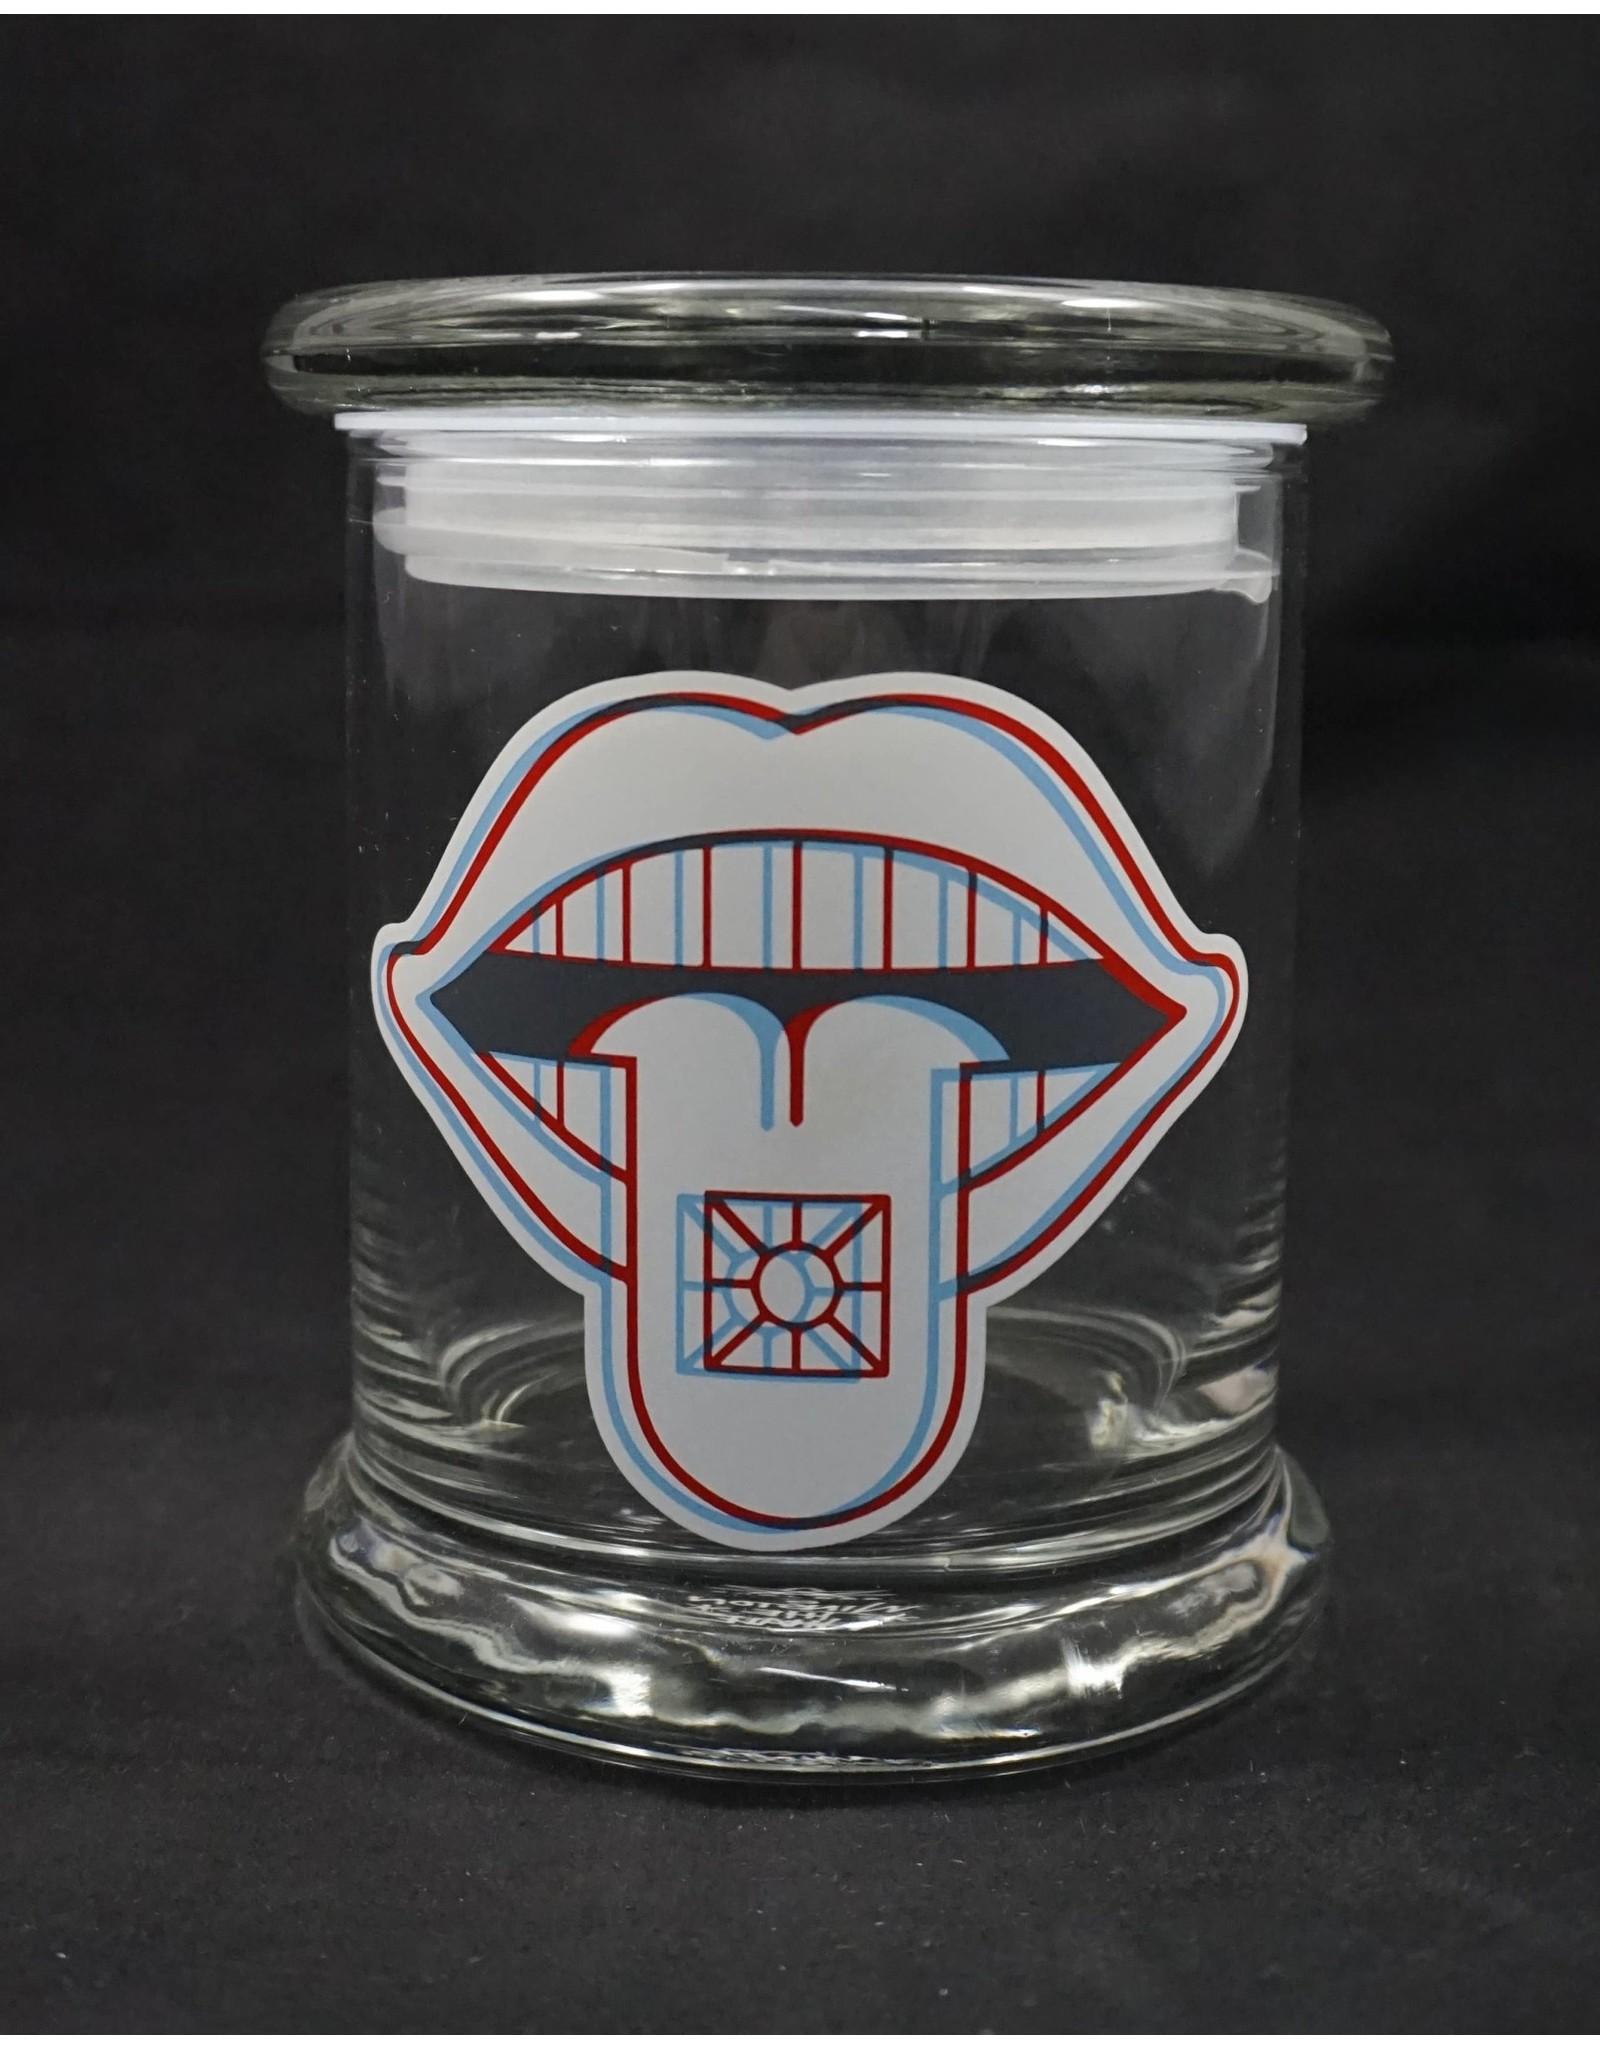 420 Science 420 Science Jars Large 3D Acid Eater Pop Top